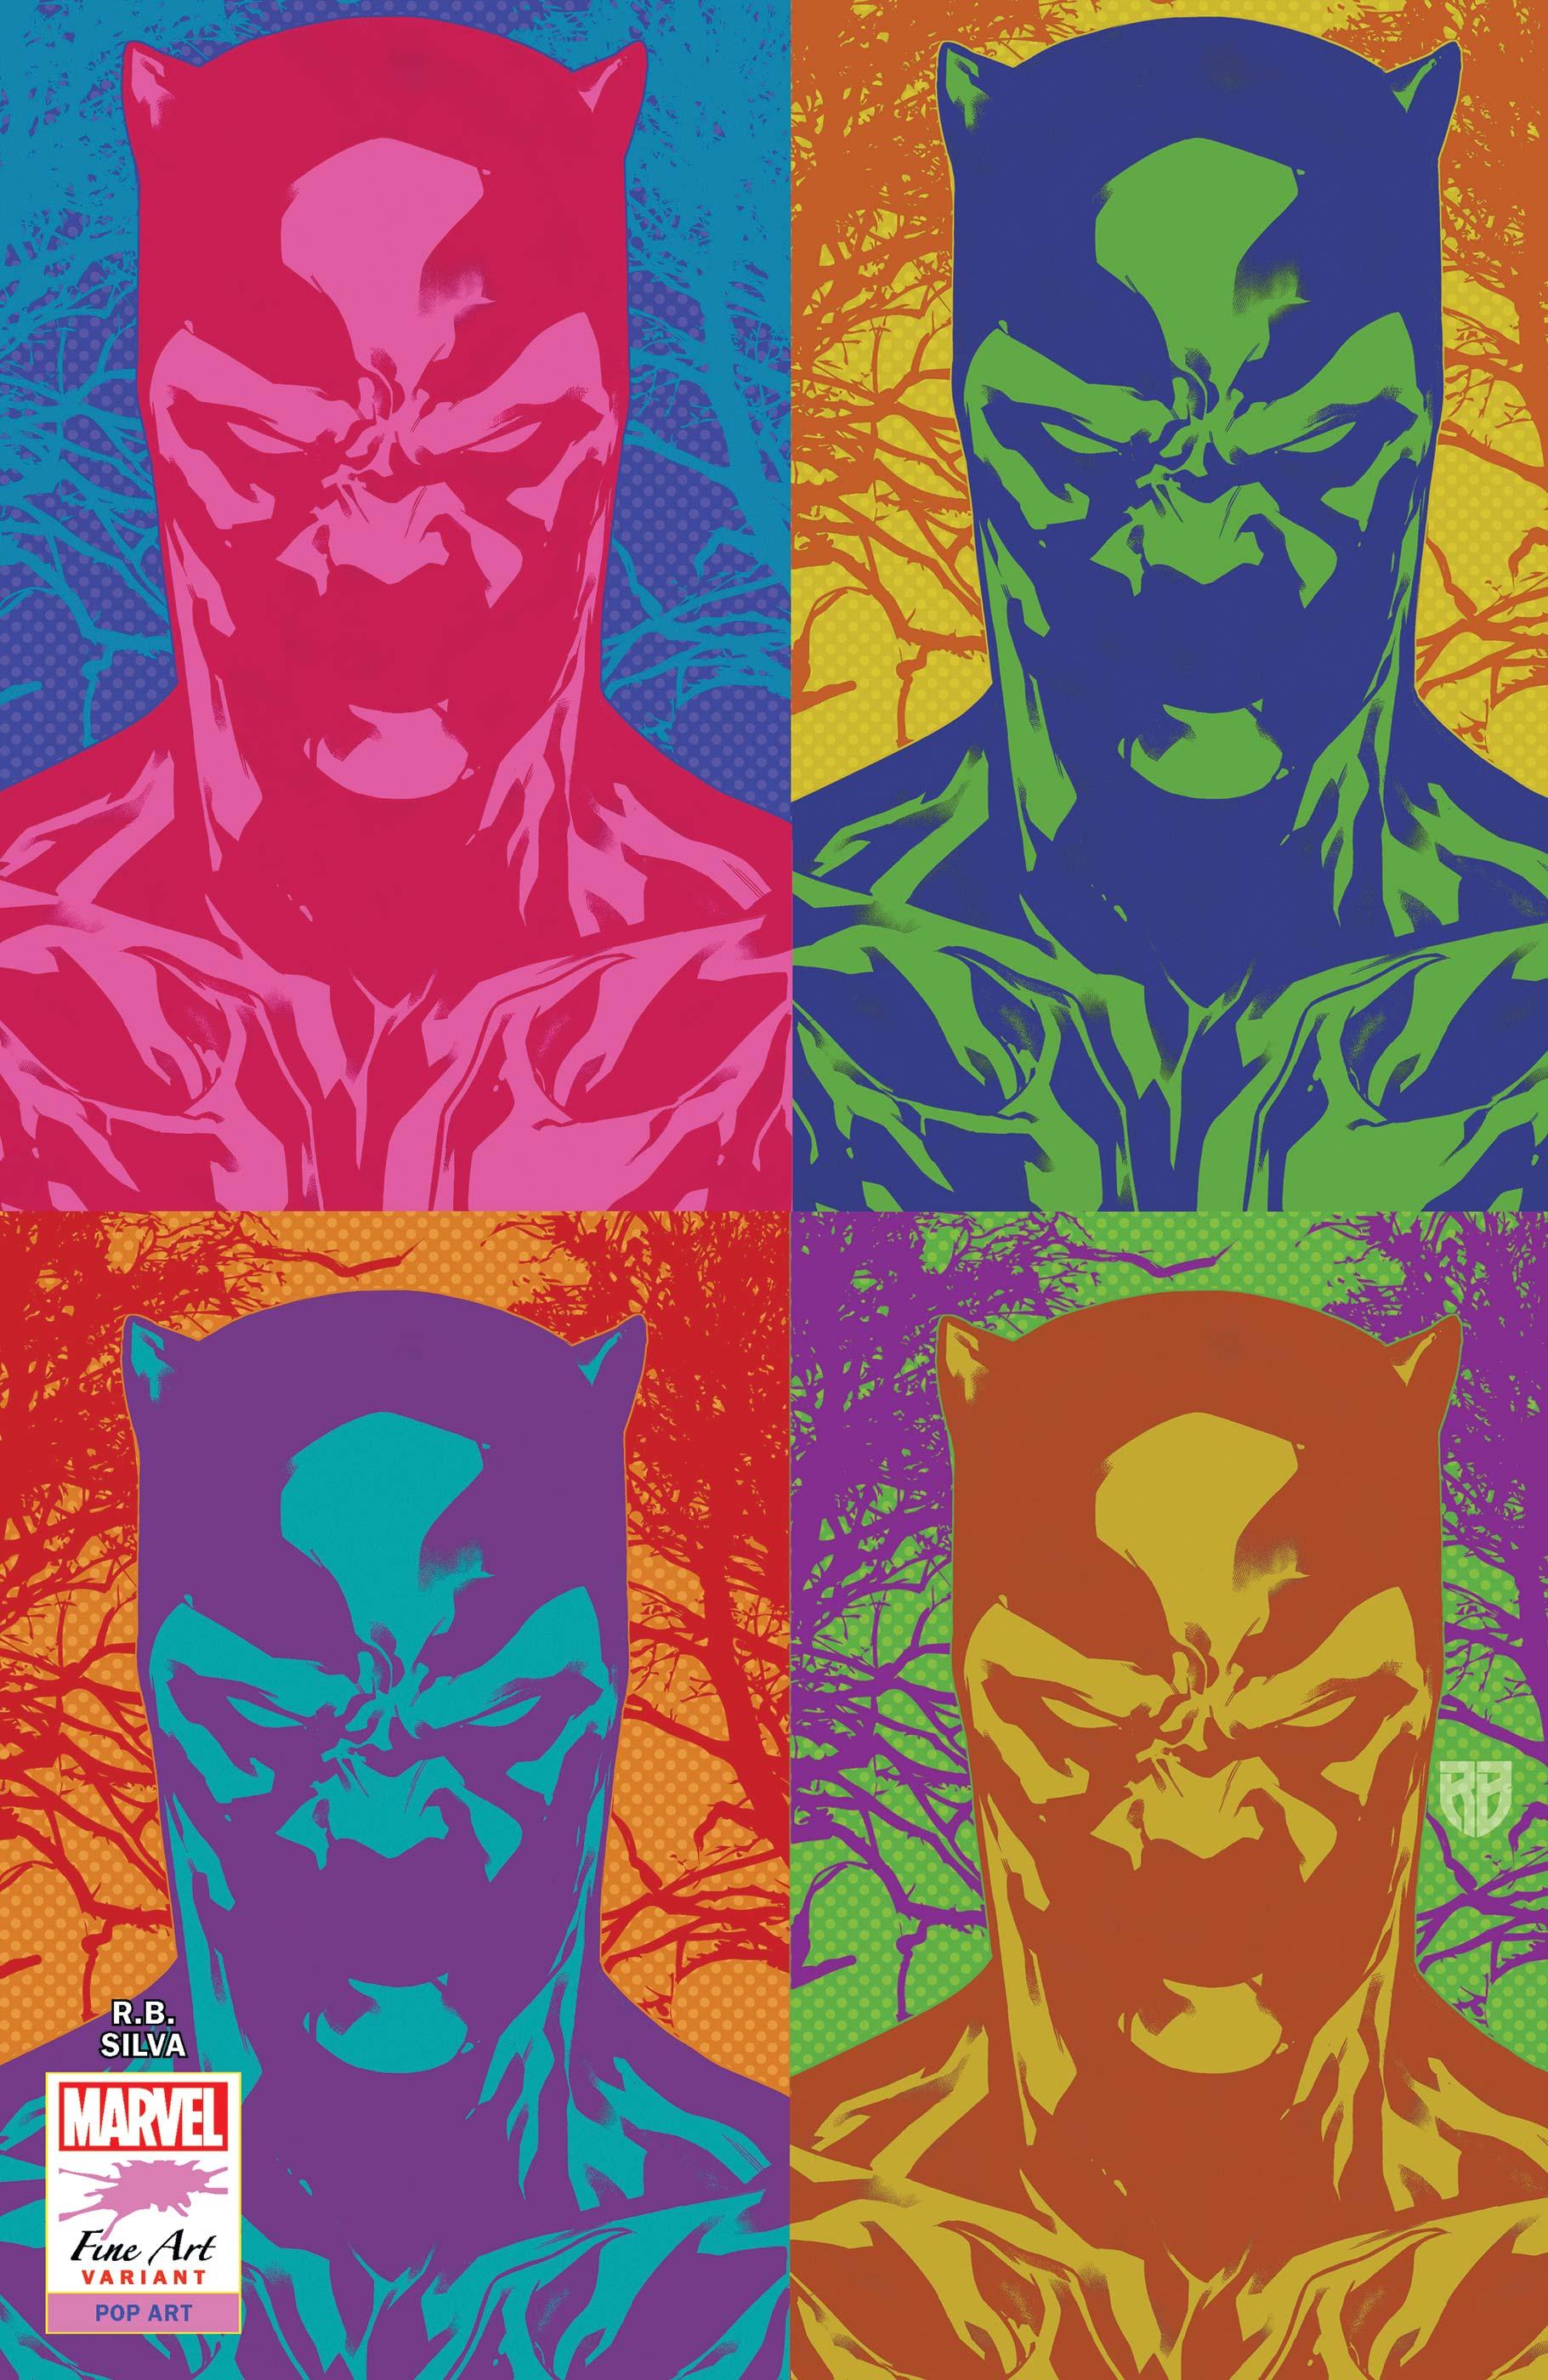 Black Panther (2018) #25 (Variant)